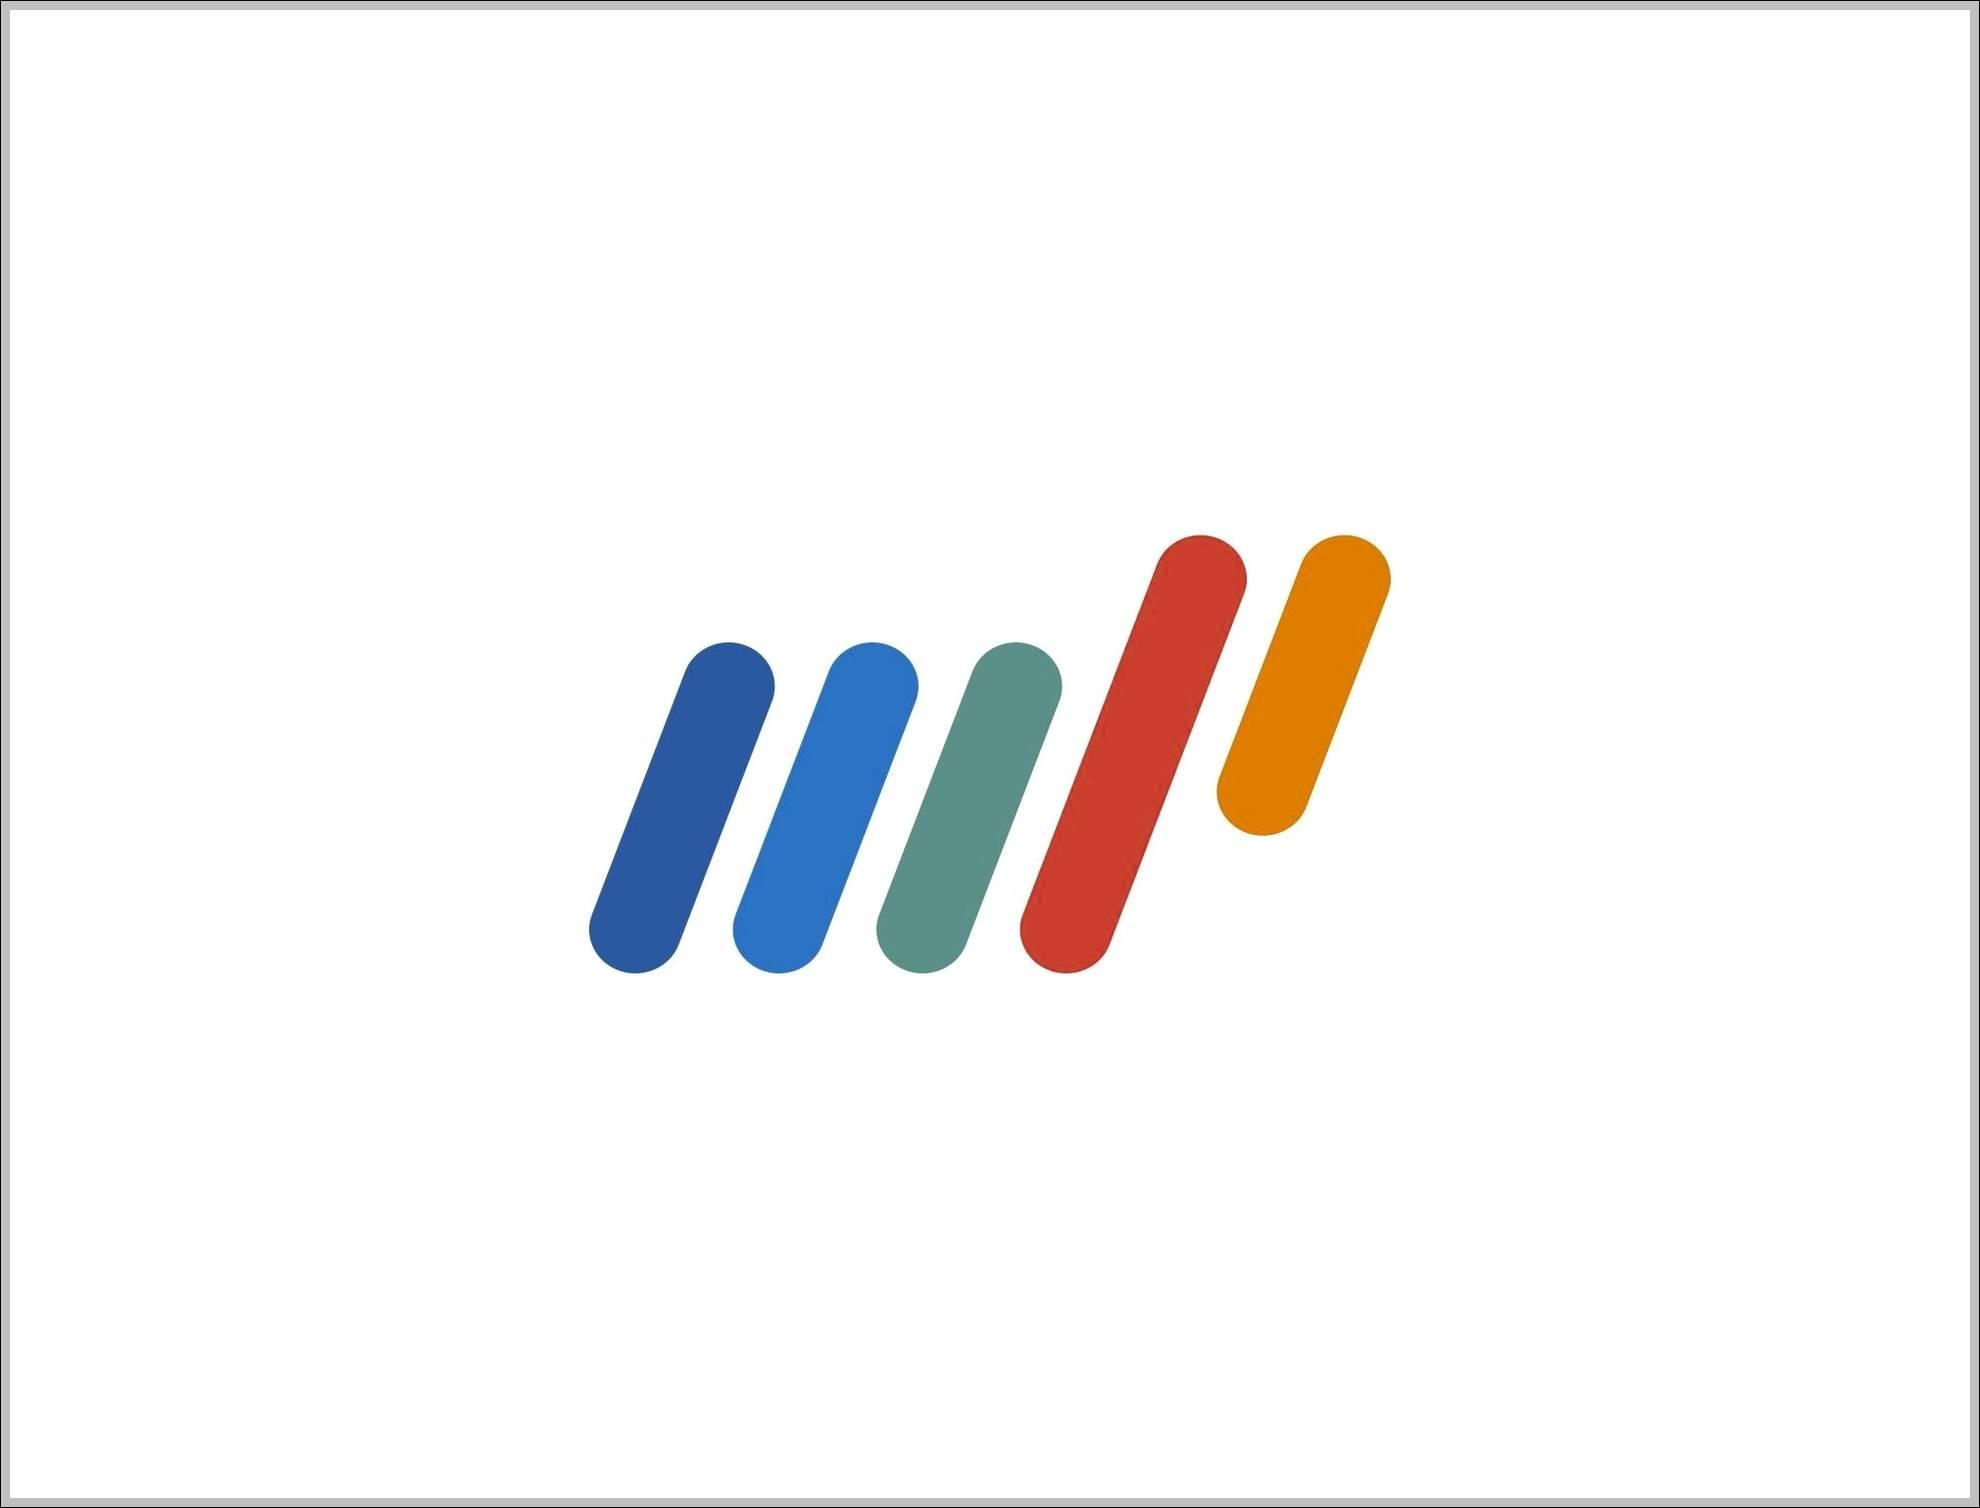 Manpower Logos Logo Sign Logos Signs Symbols